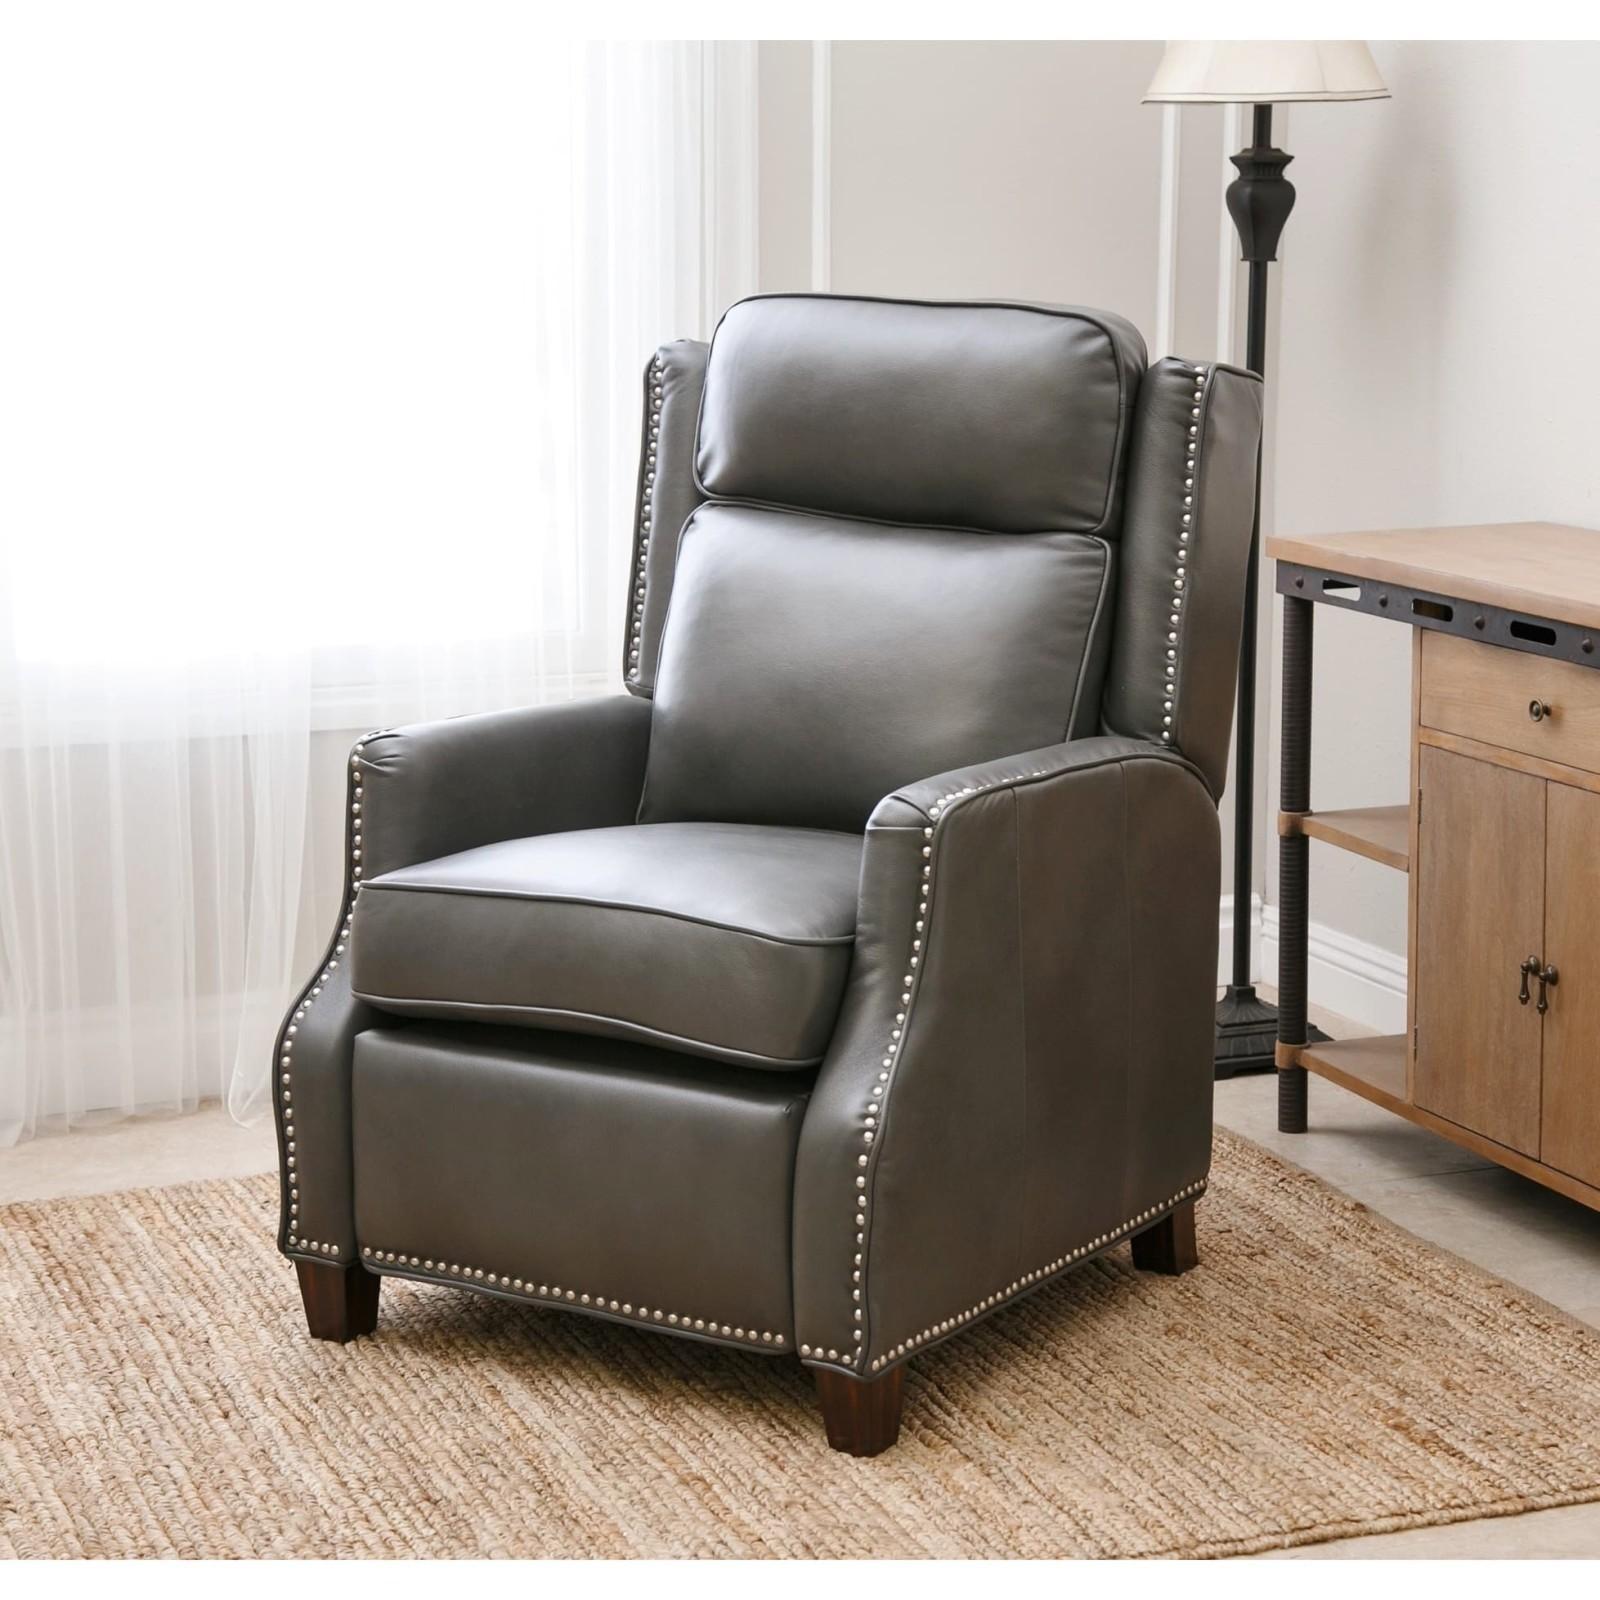 abbyson living rocking chair wheelchair outline 20 best recliners sofa ideas